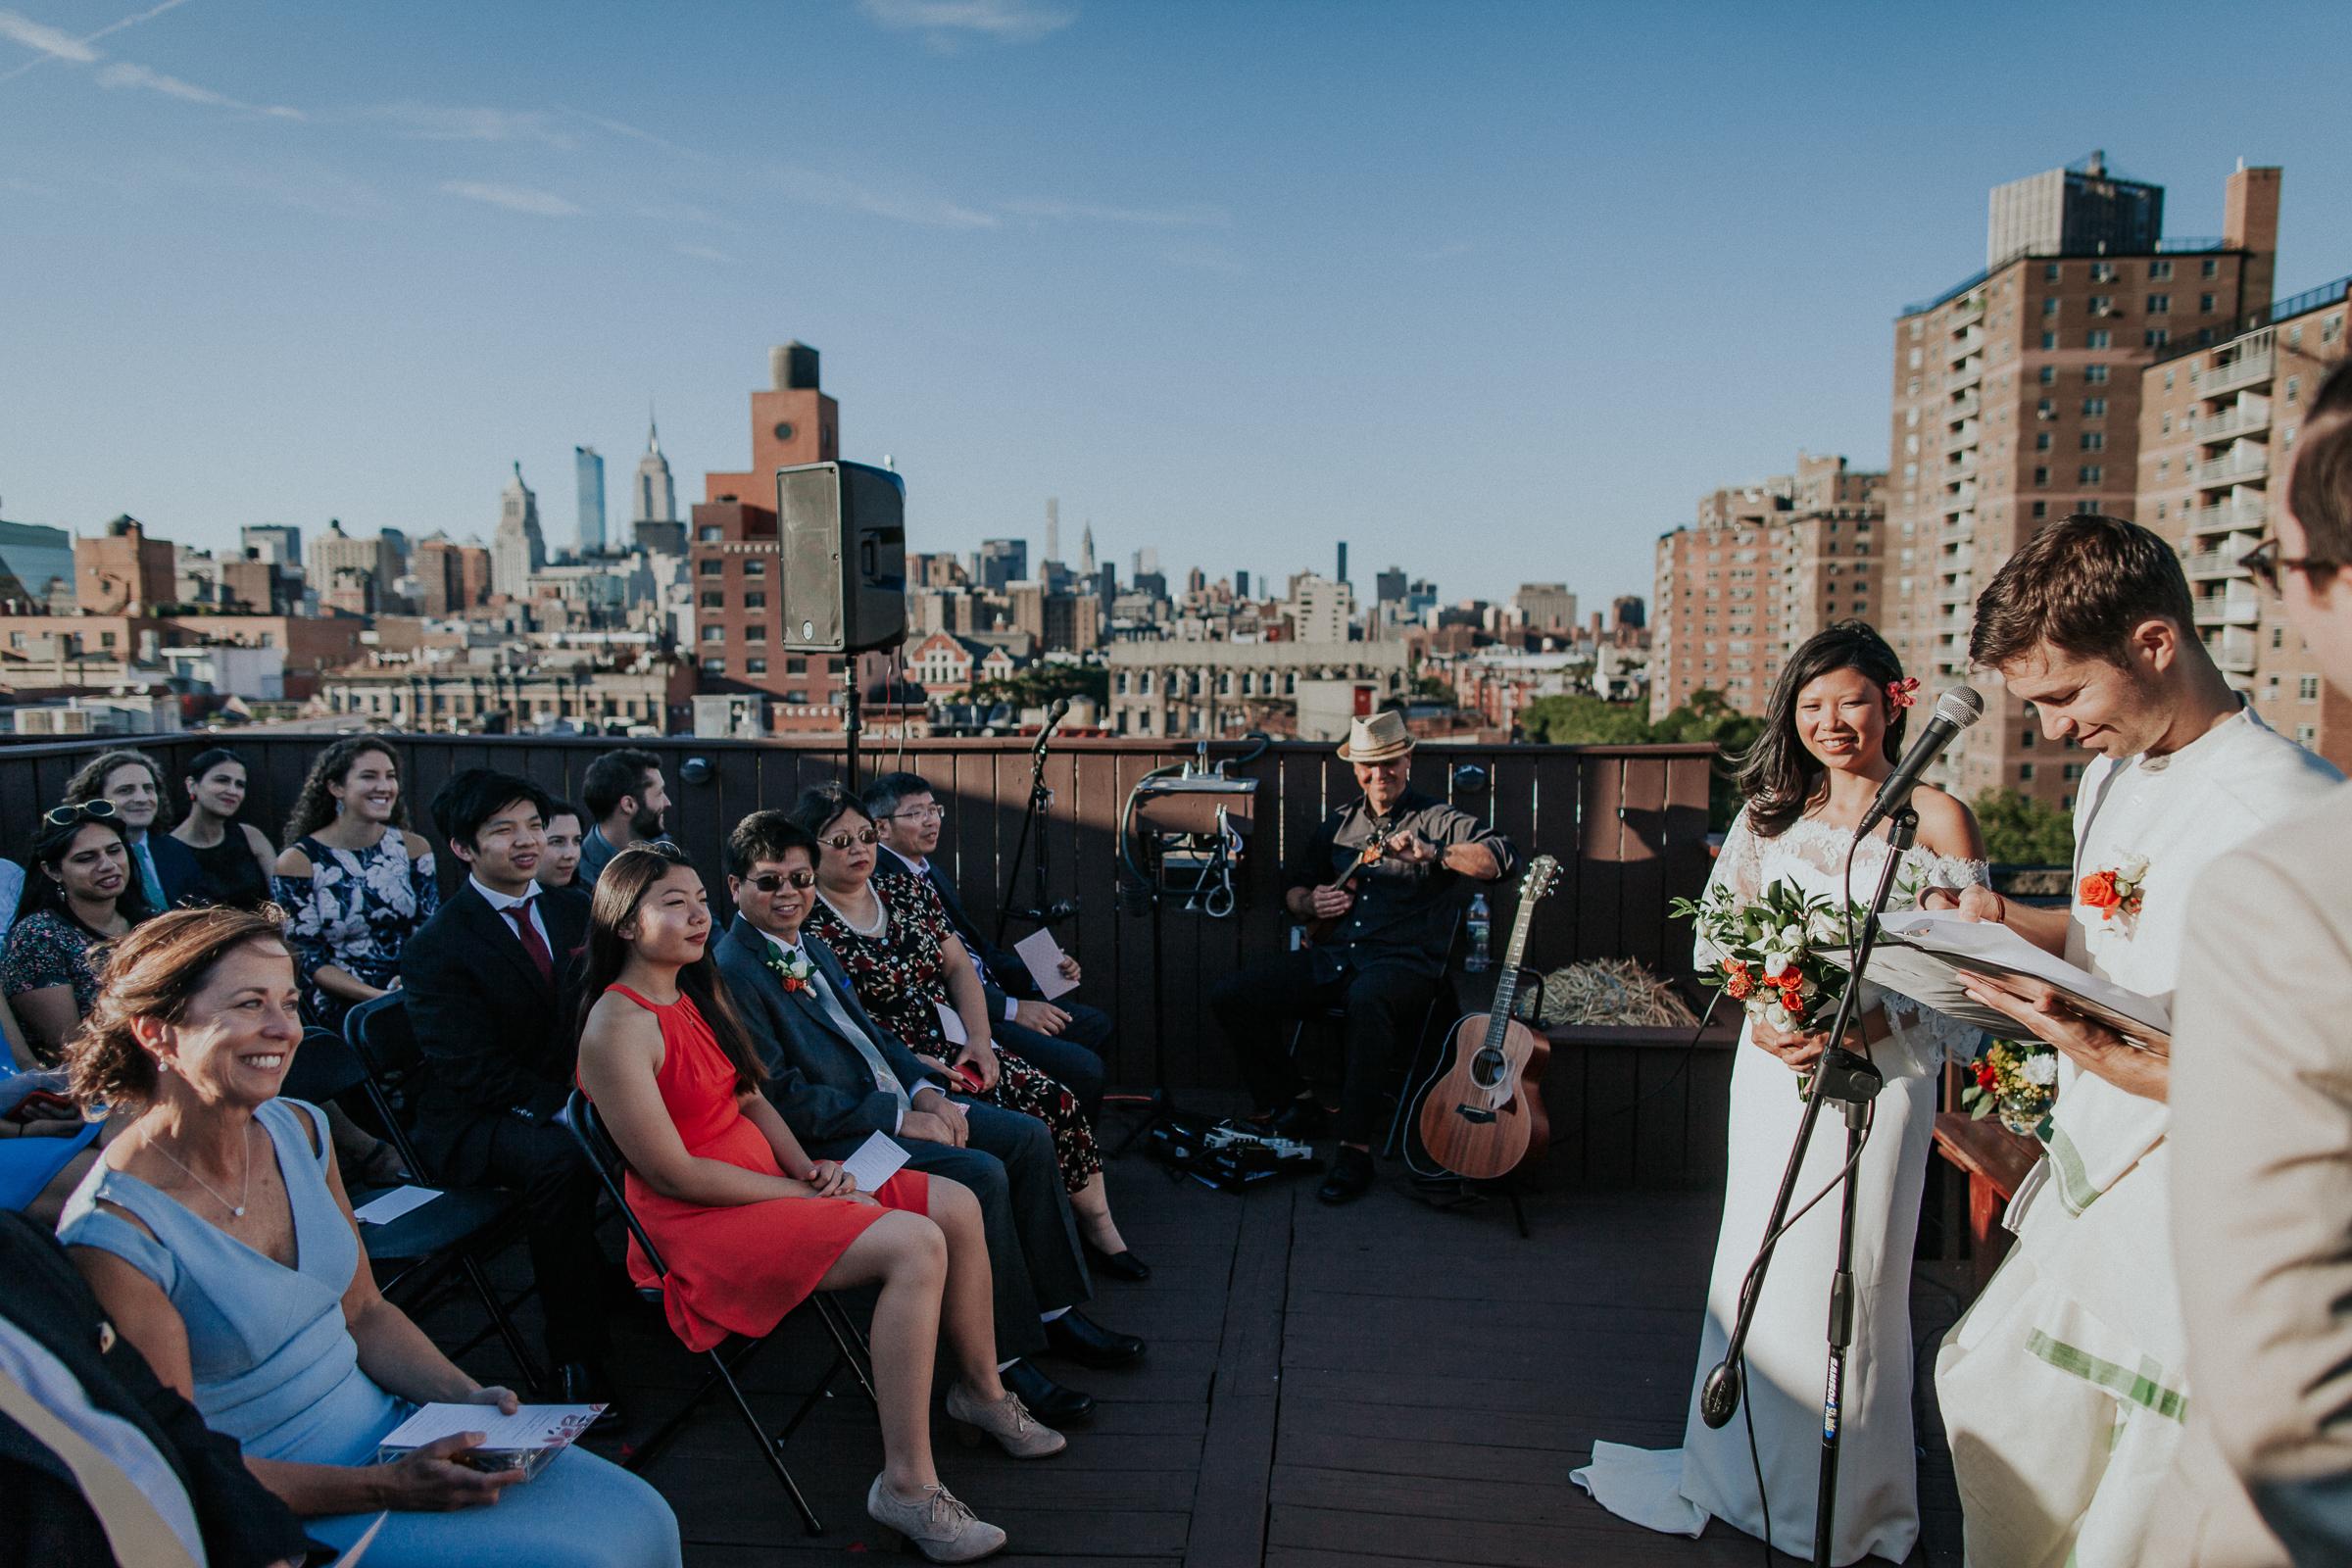 The-Bhakti-Center-Yoga-NYC-Rooftop-Documentary-Wedding-Photographer-34.jpg